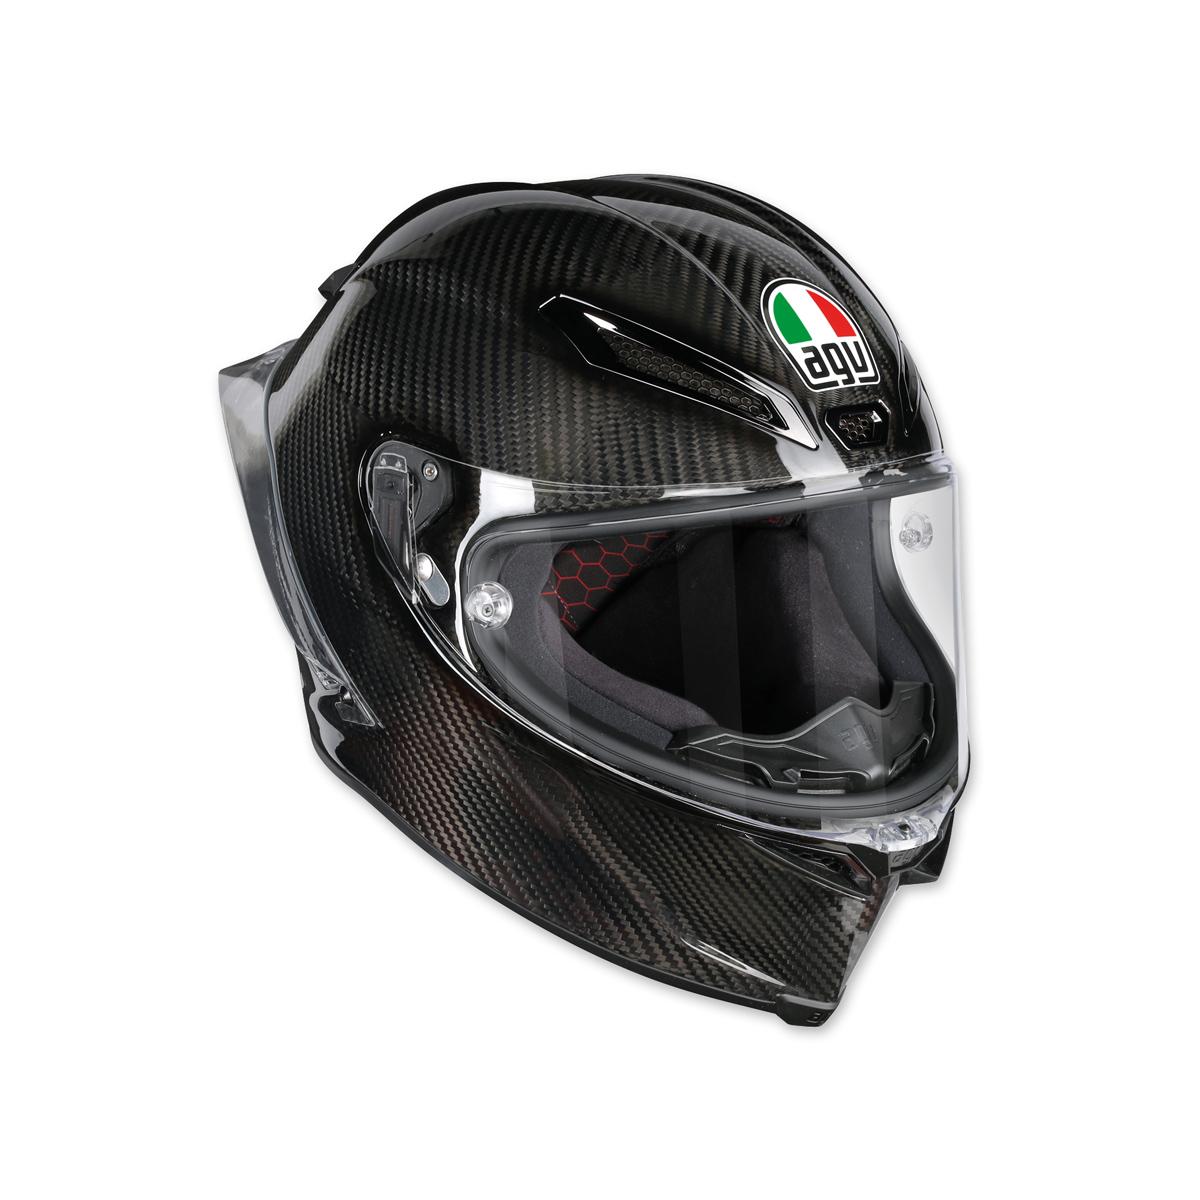 AGV Pista GP R Gloss Carbon Full Face Helmet